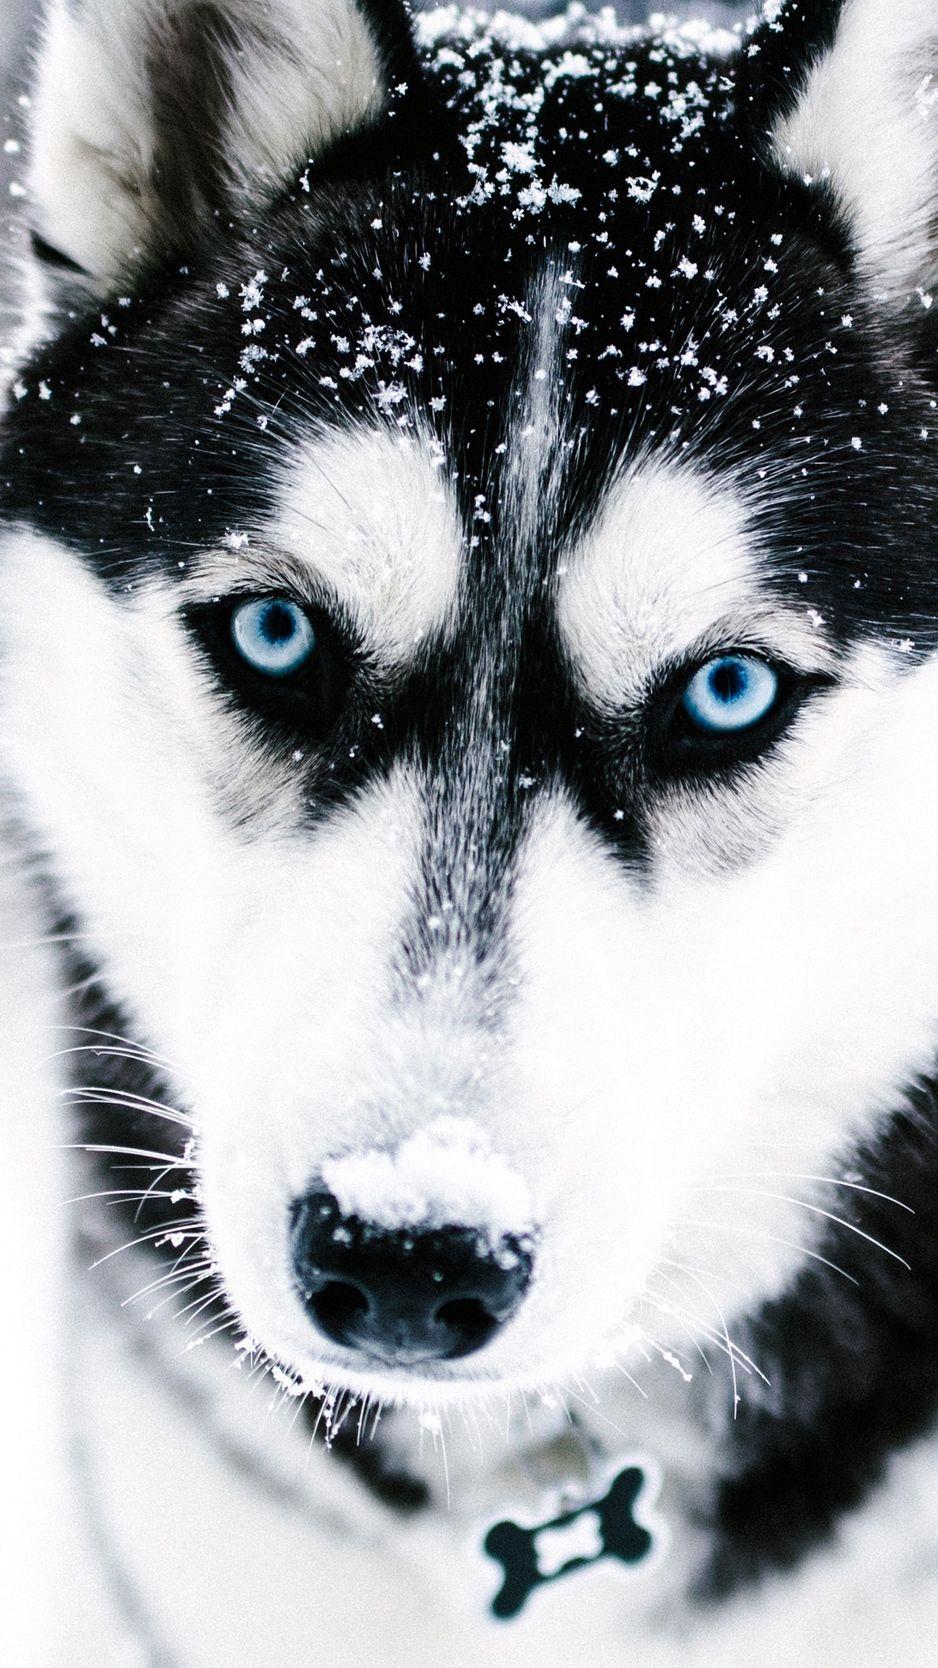 Husky Dog Muzzle Blue Eyed Background Cute Husky Puppies Huskies Dogs Blue Eyes Baby Dogs